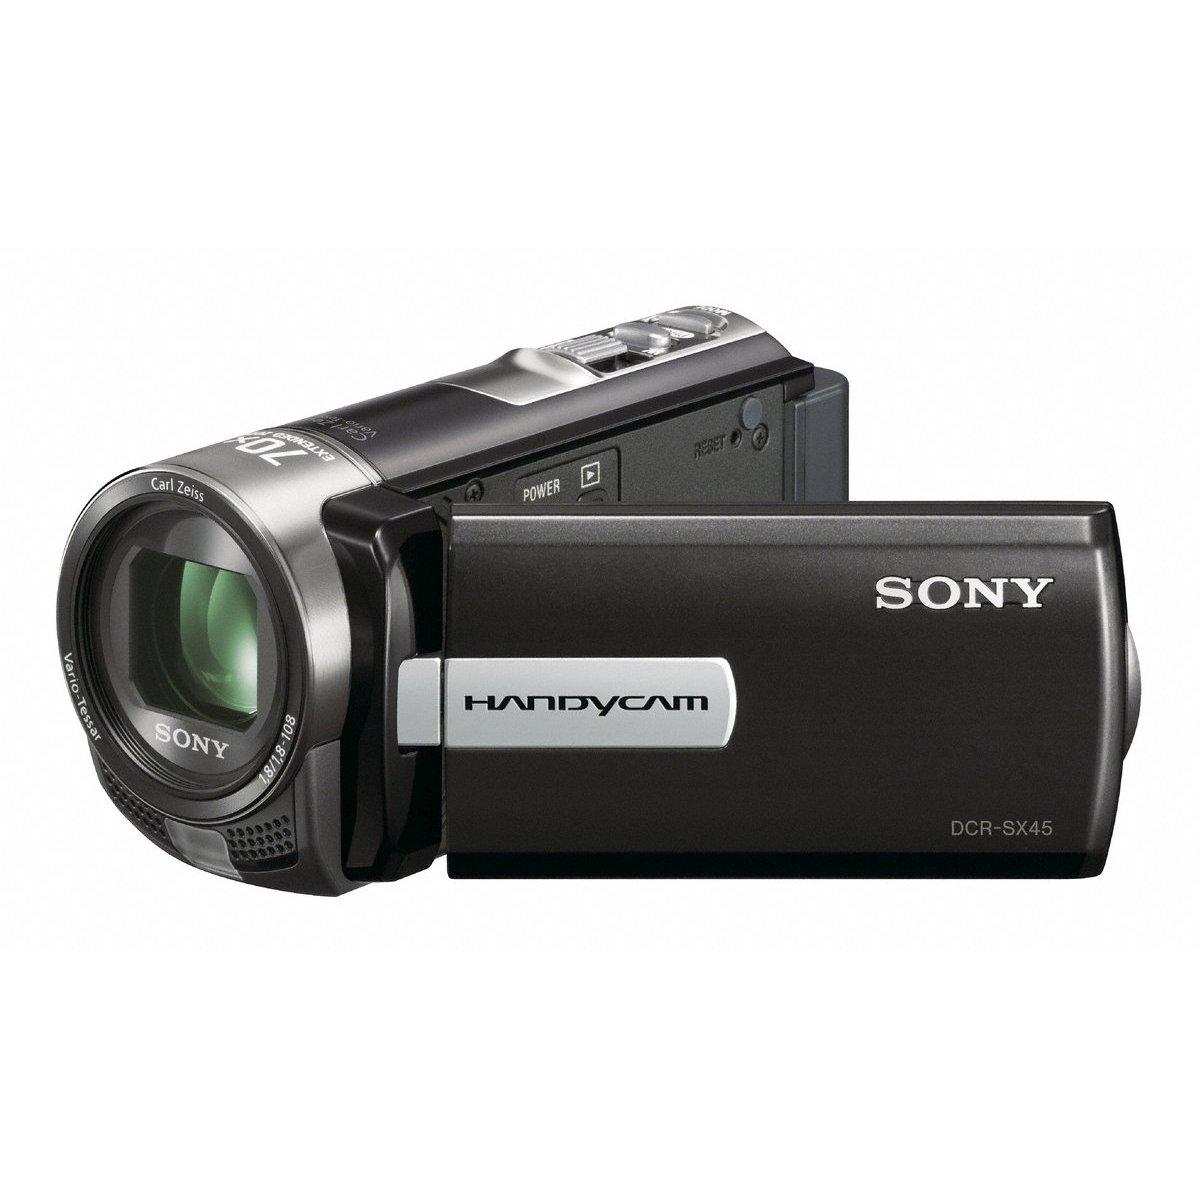 https://thetechjournal.com/wp-content/uploads/images/1108/1314692838-sony-dcrsx45-handycam-camcorder--1.jpg